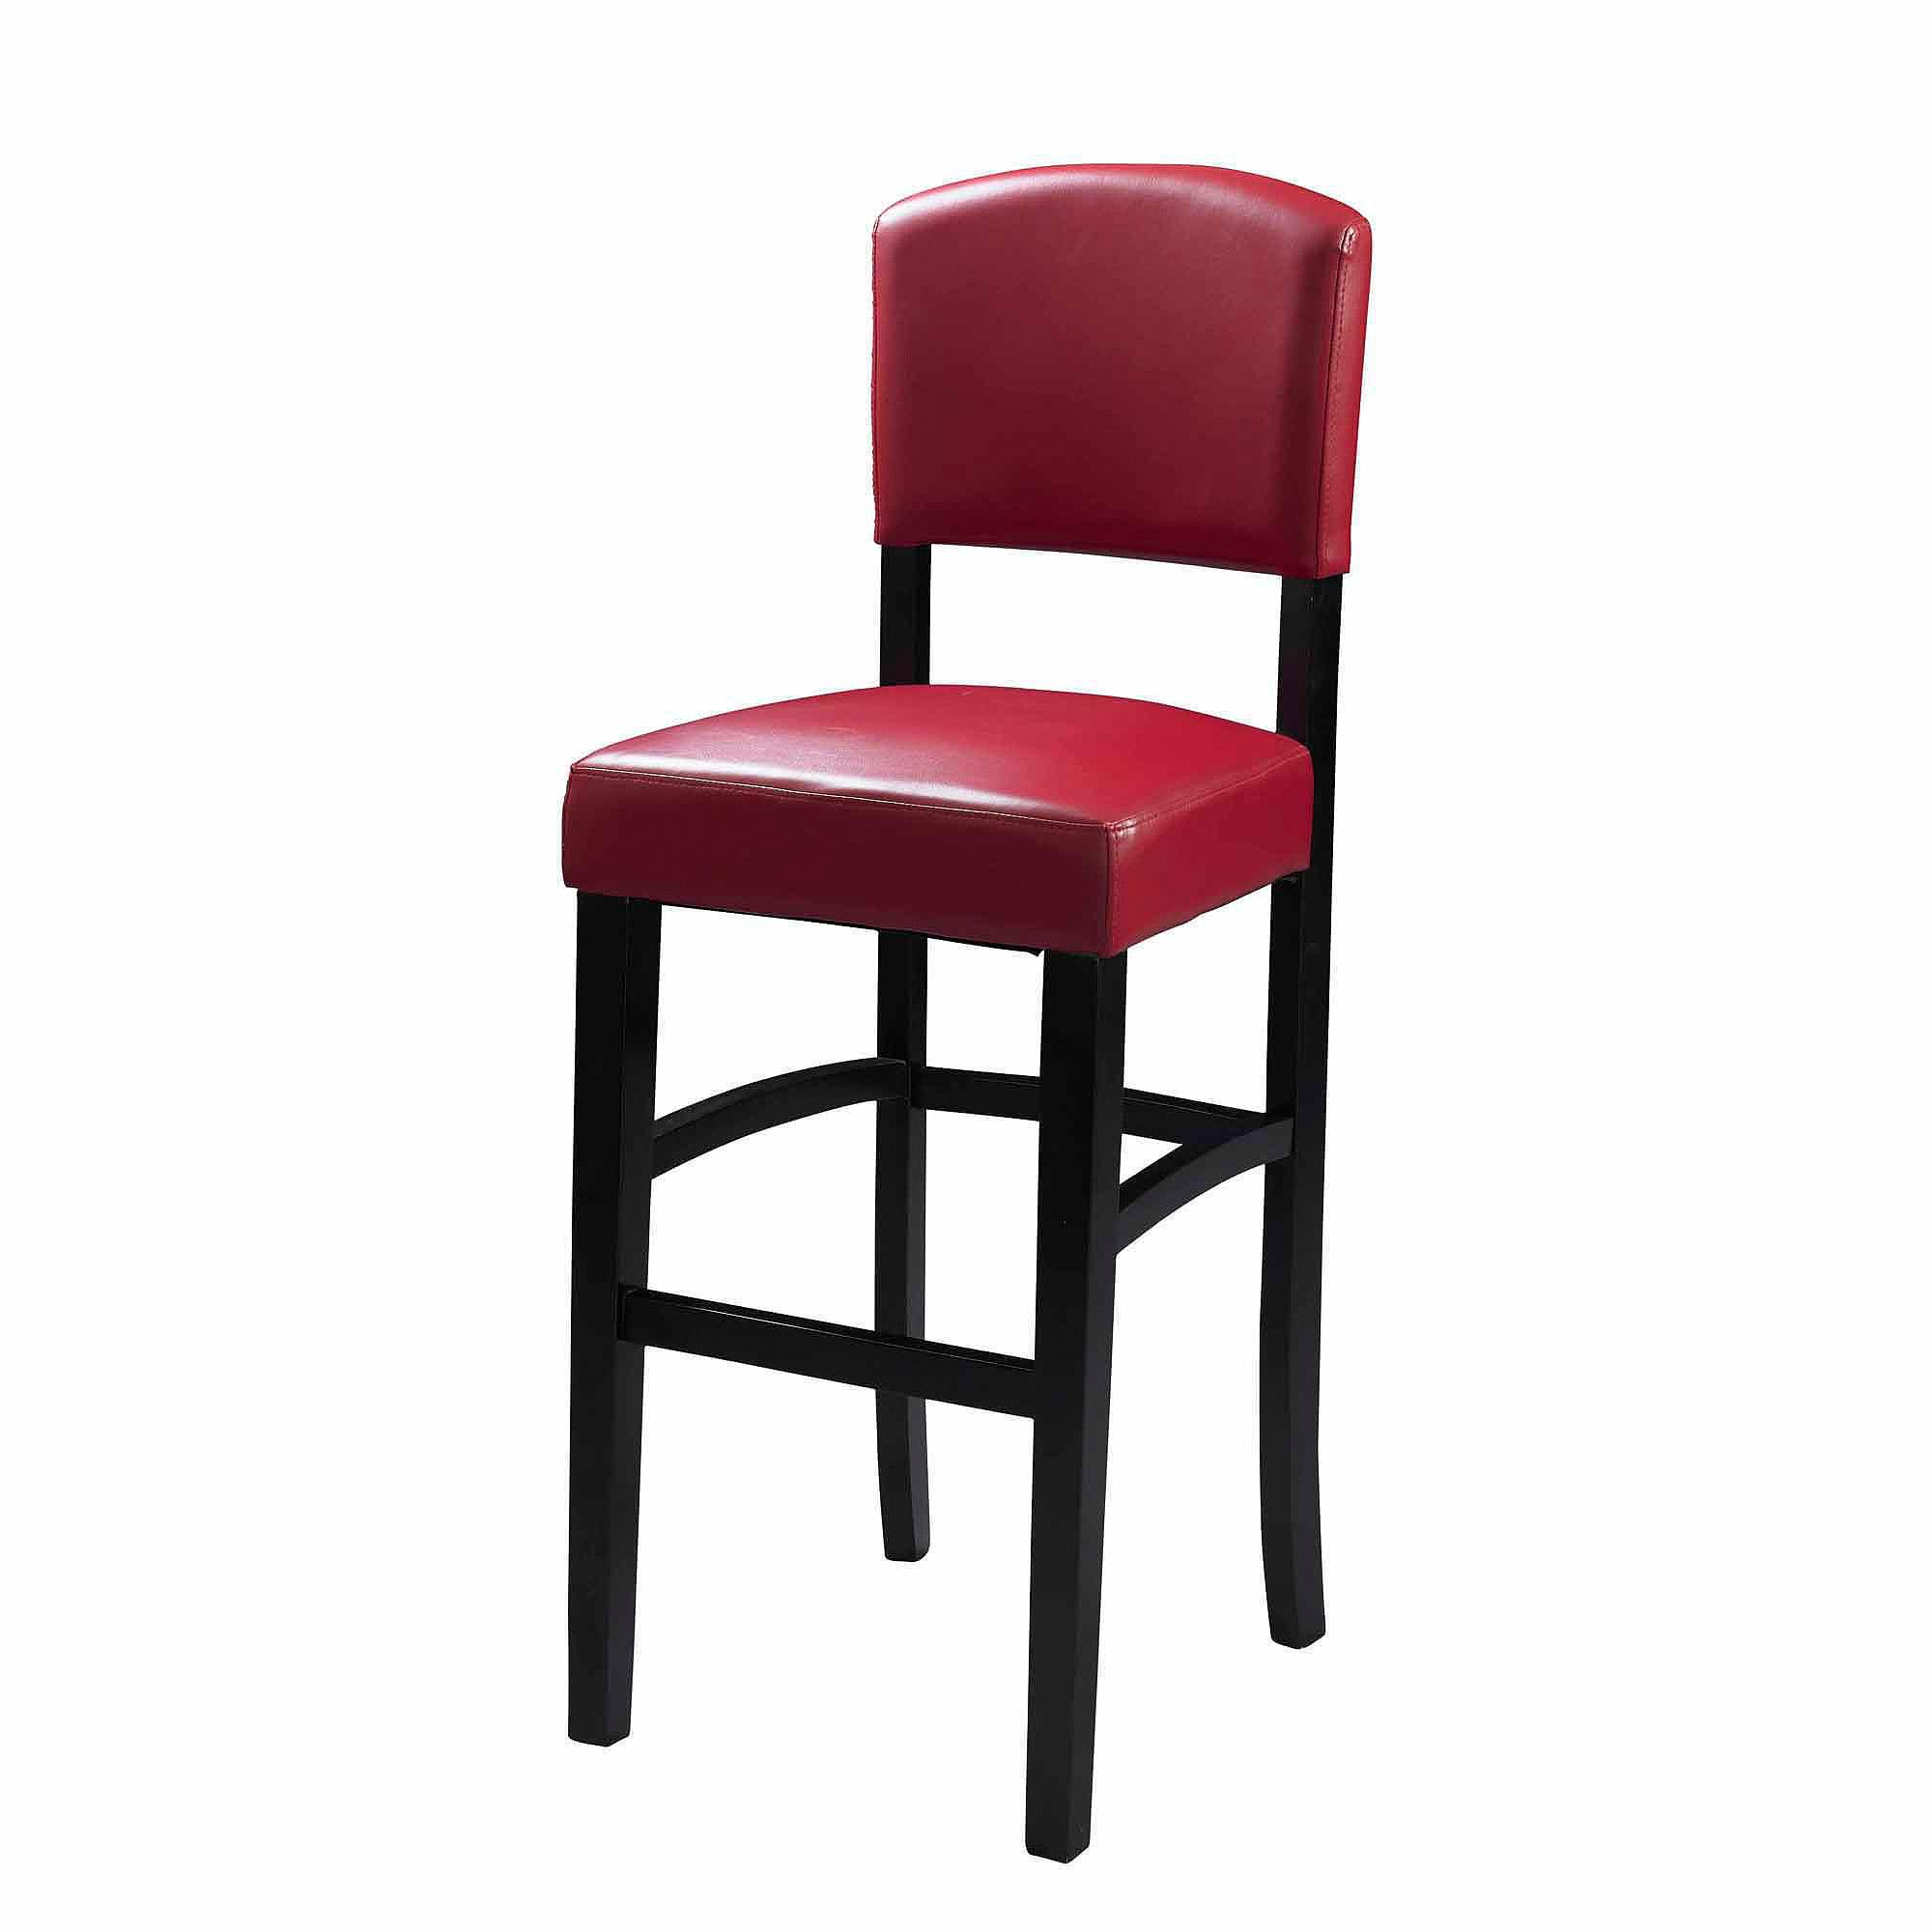 Linon Monaco Counter Stool Dark Red 24 Inch Seat Height